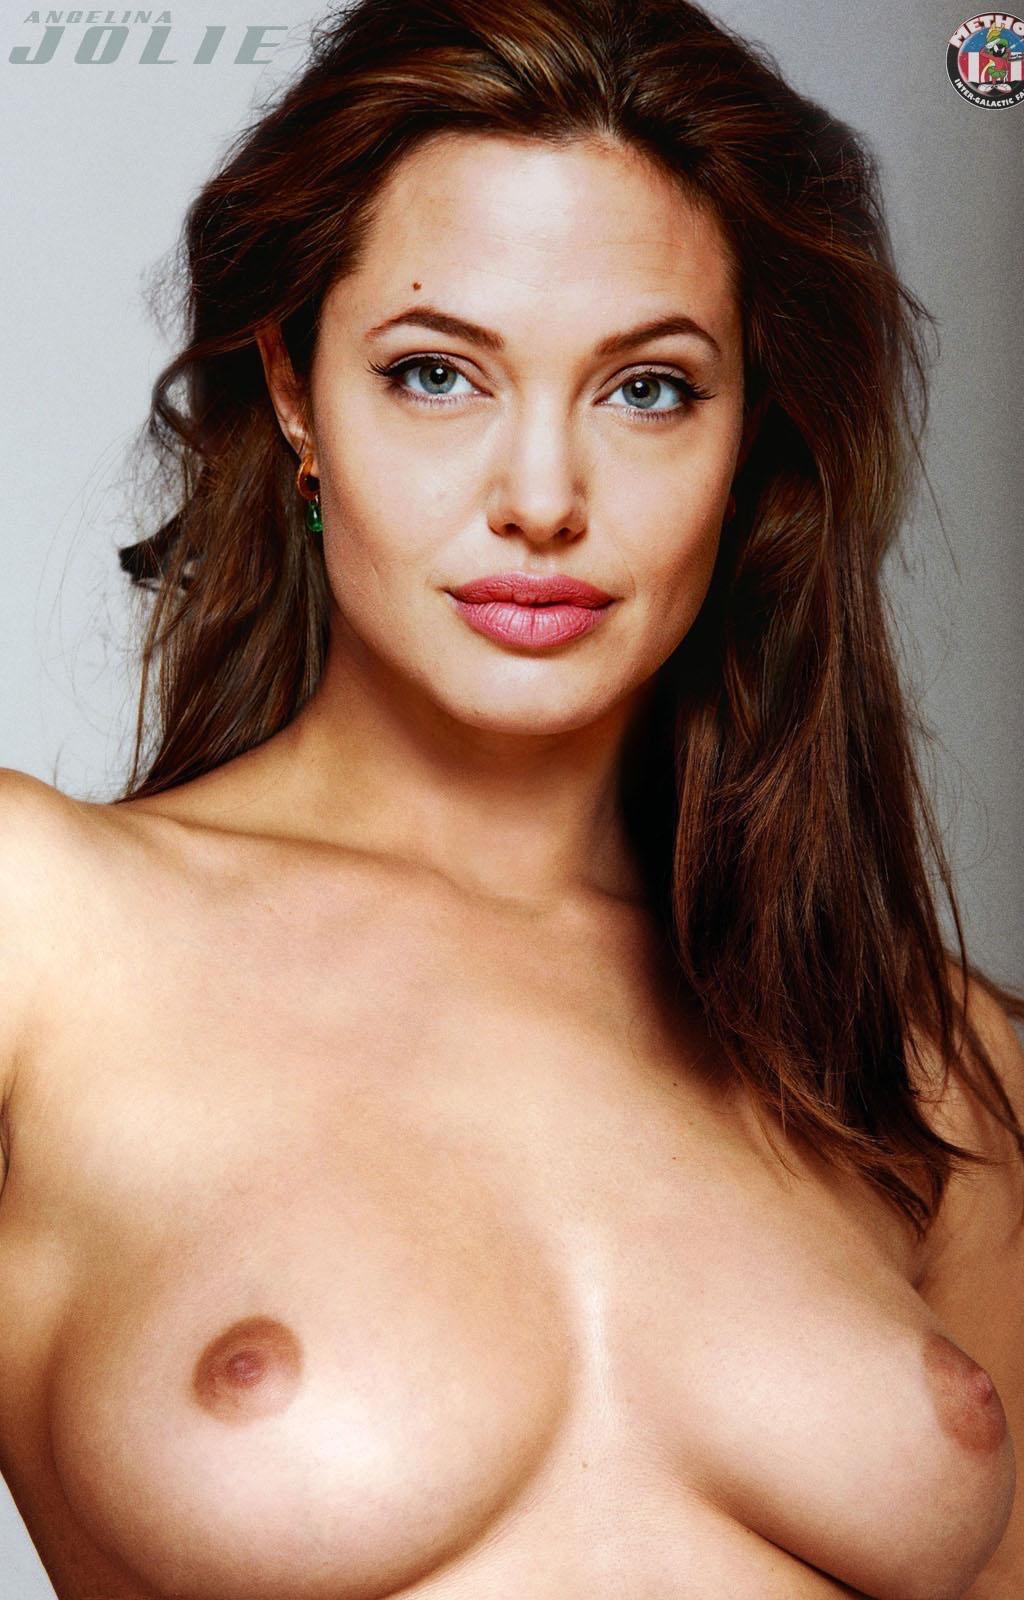 Sexy Pics Of Angelina